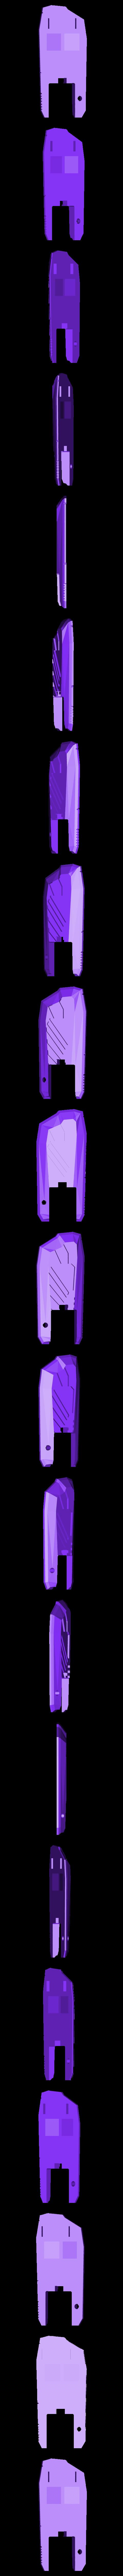 v05pt1corrected_back_R.stl Download free STL file TRANSFORMERS G1 CW Superion Thigs • 3D print model, sickofyou